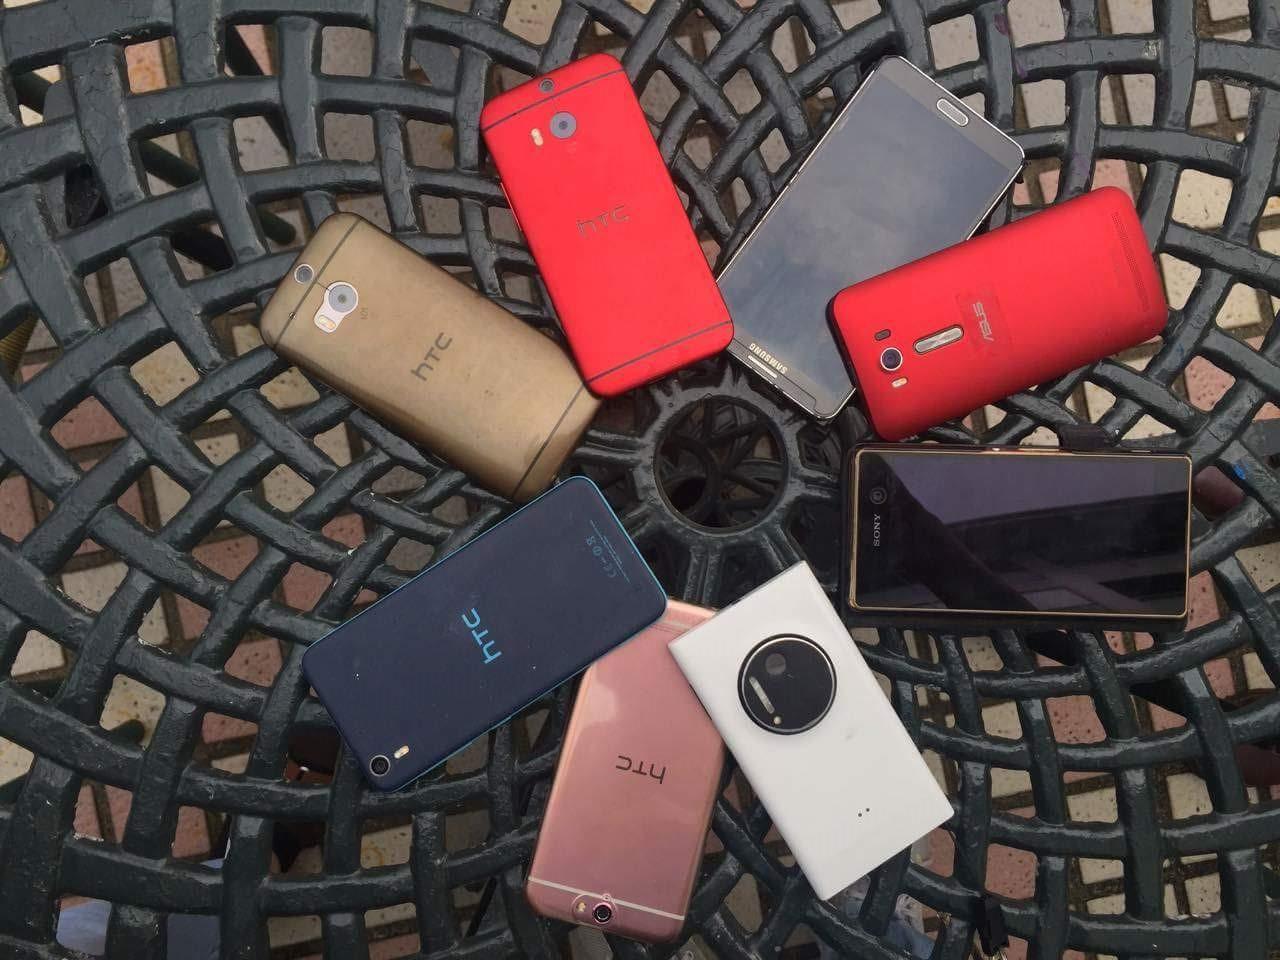 HTC 將以高品質手機取代機海戰術,望重返國際舞台。攝影/黃俐禎